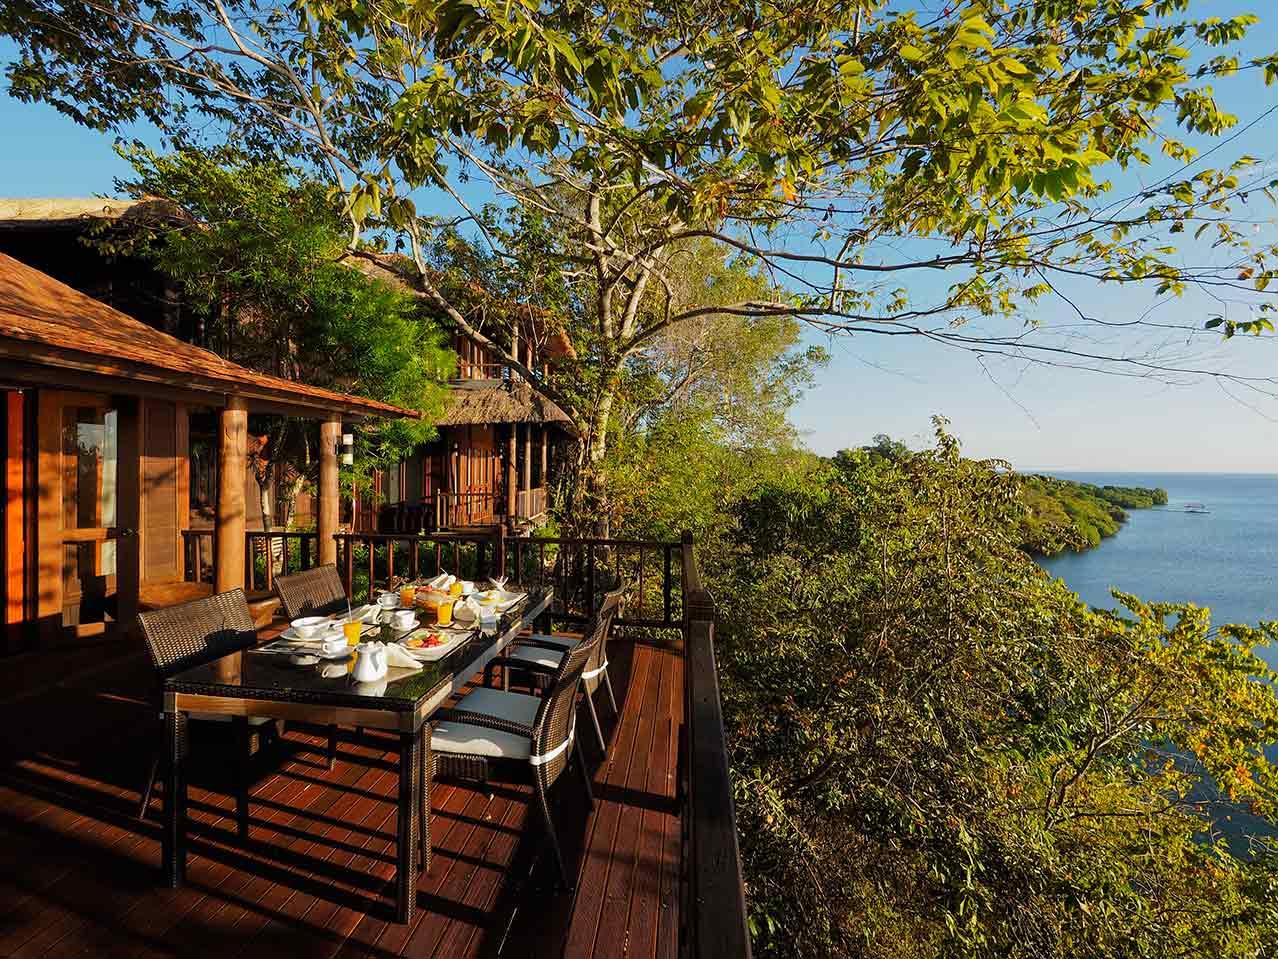 The_Menjangan_Residence_breakfast_at_balcony.jpg